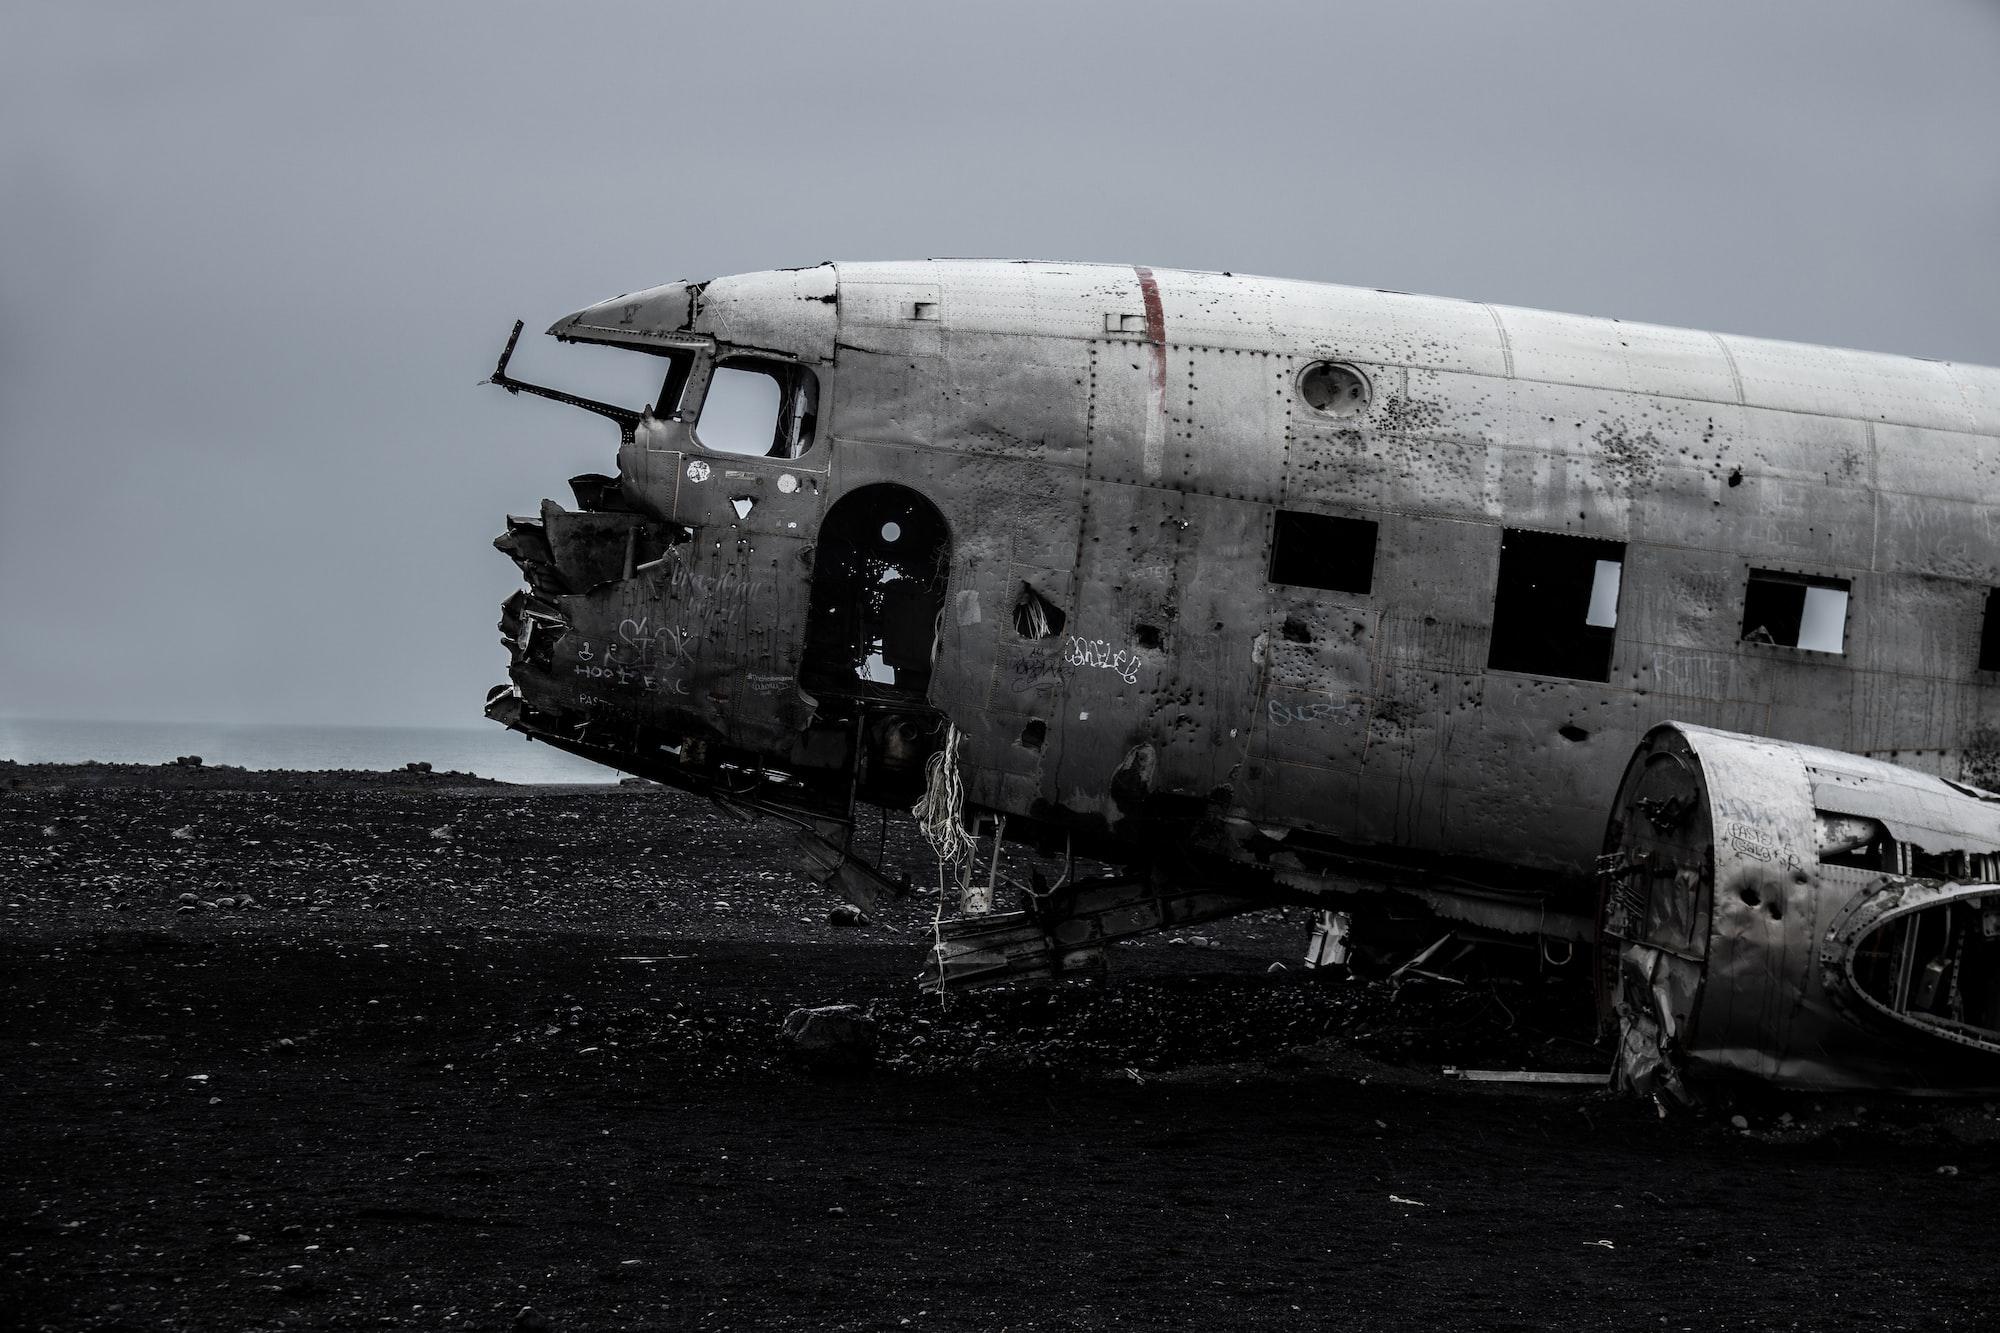 plane wrack island north destroyed iceland seebach crashed bad sad angry flying sand beach ocean